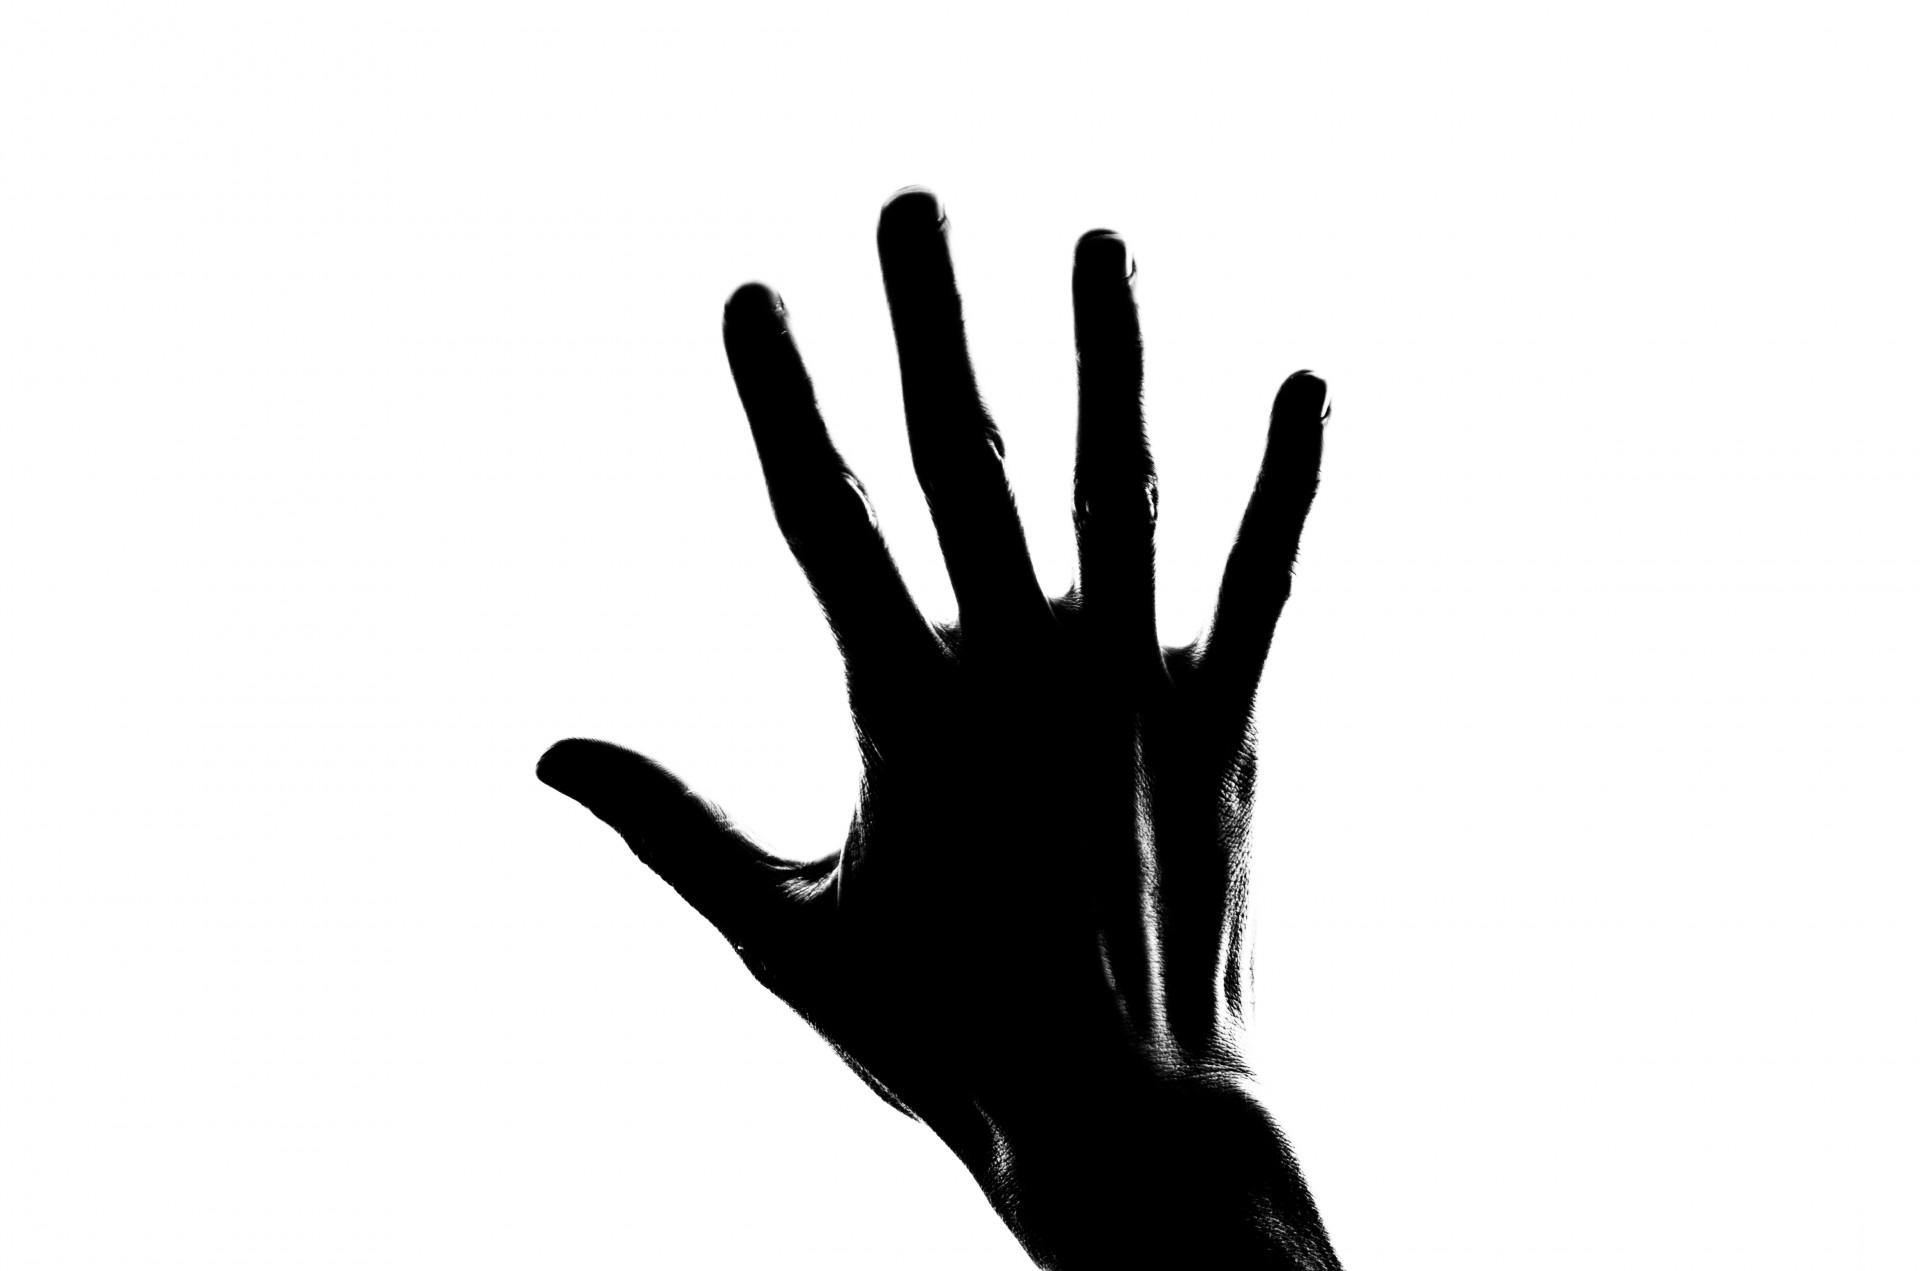 1920x1271 Silhouette Woman Hand Free Stock Photo